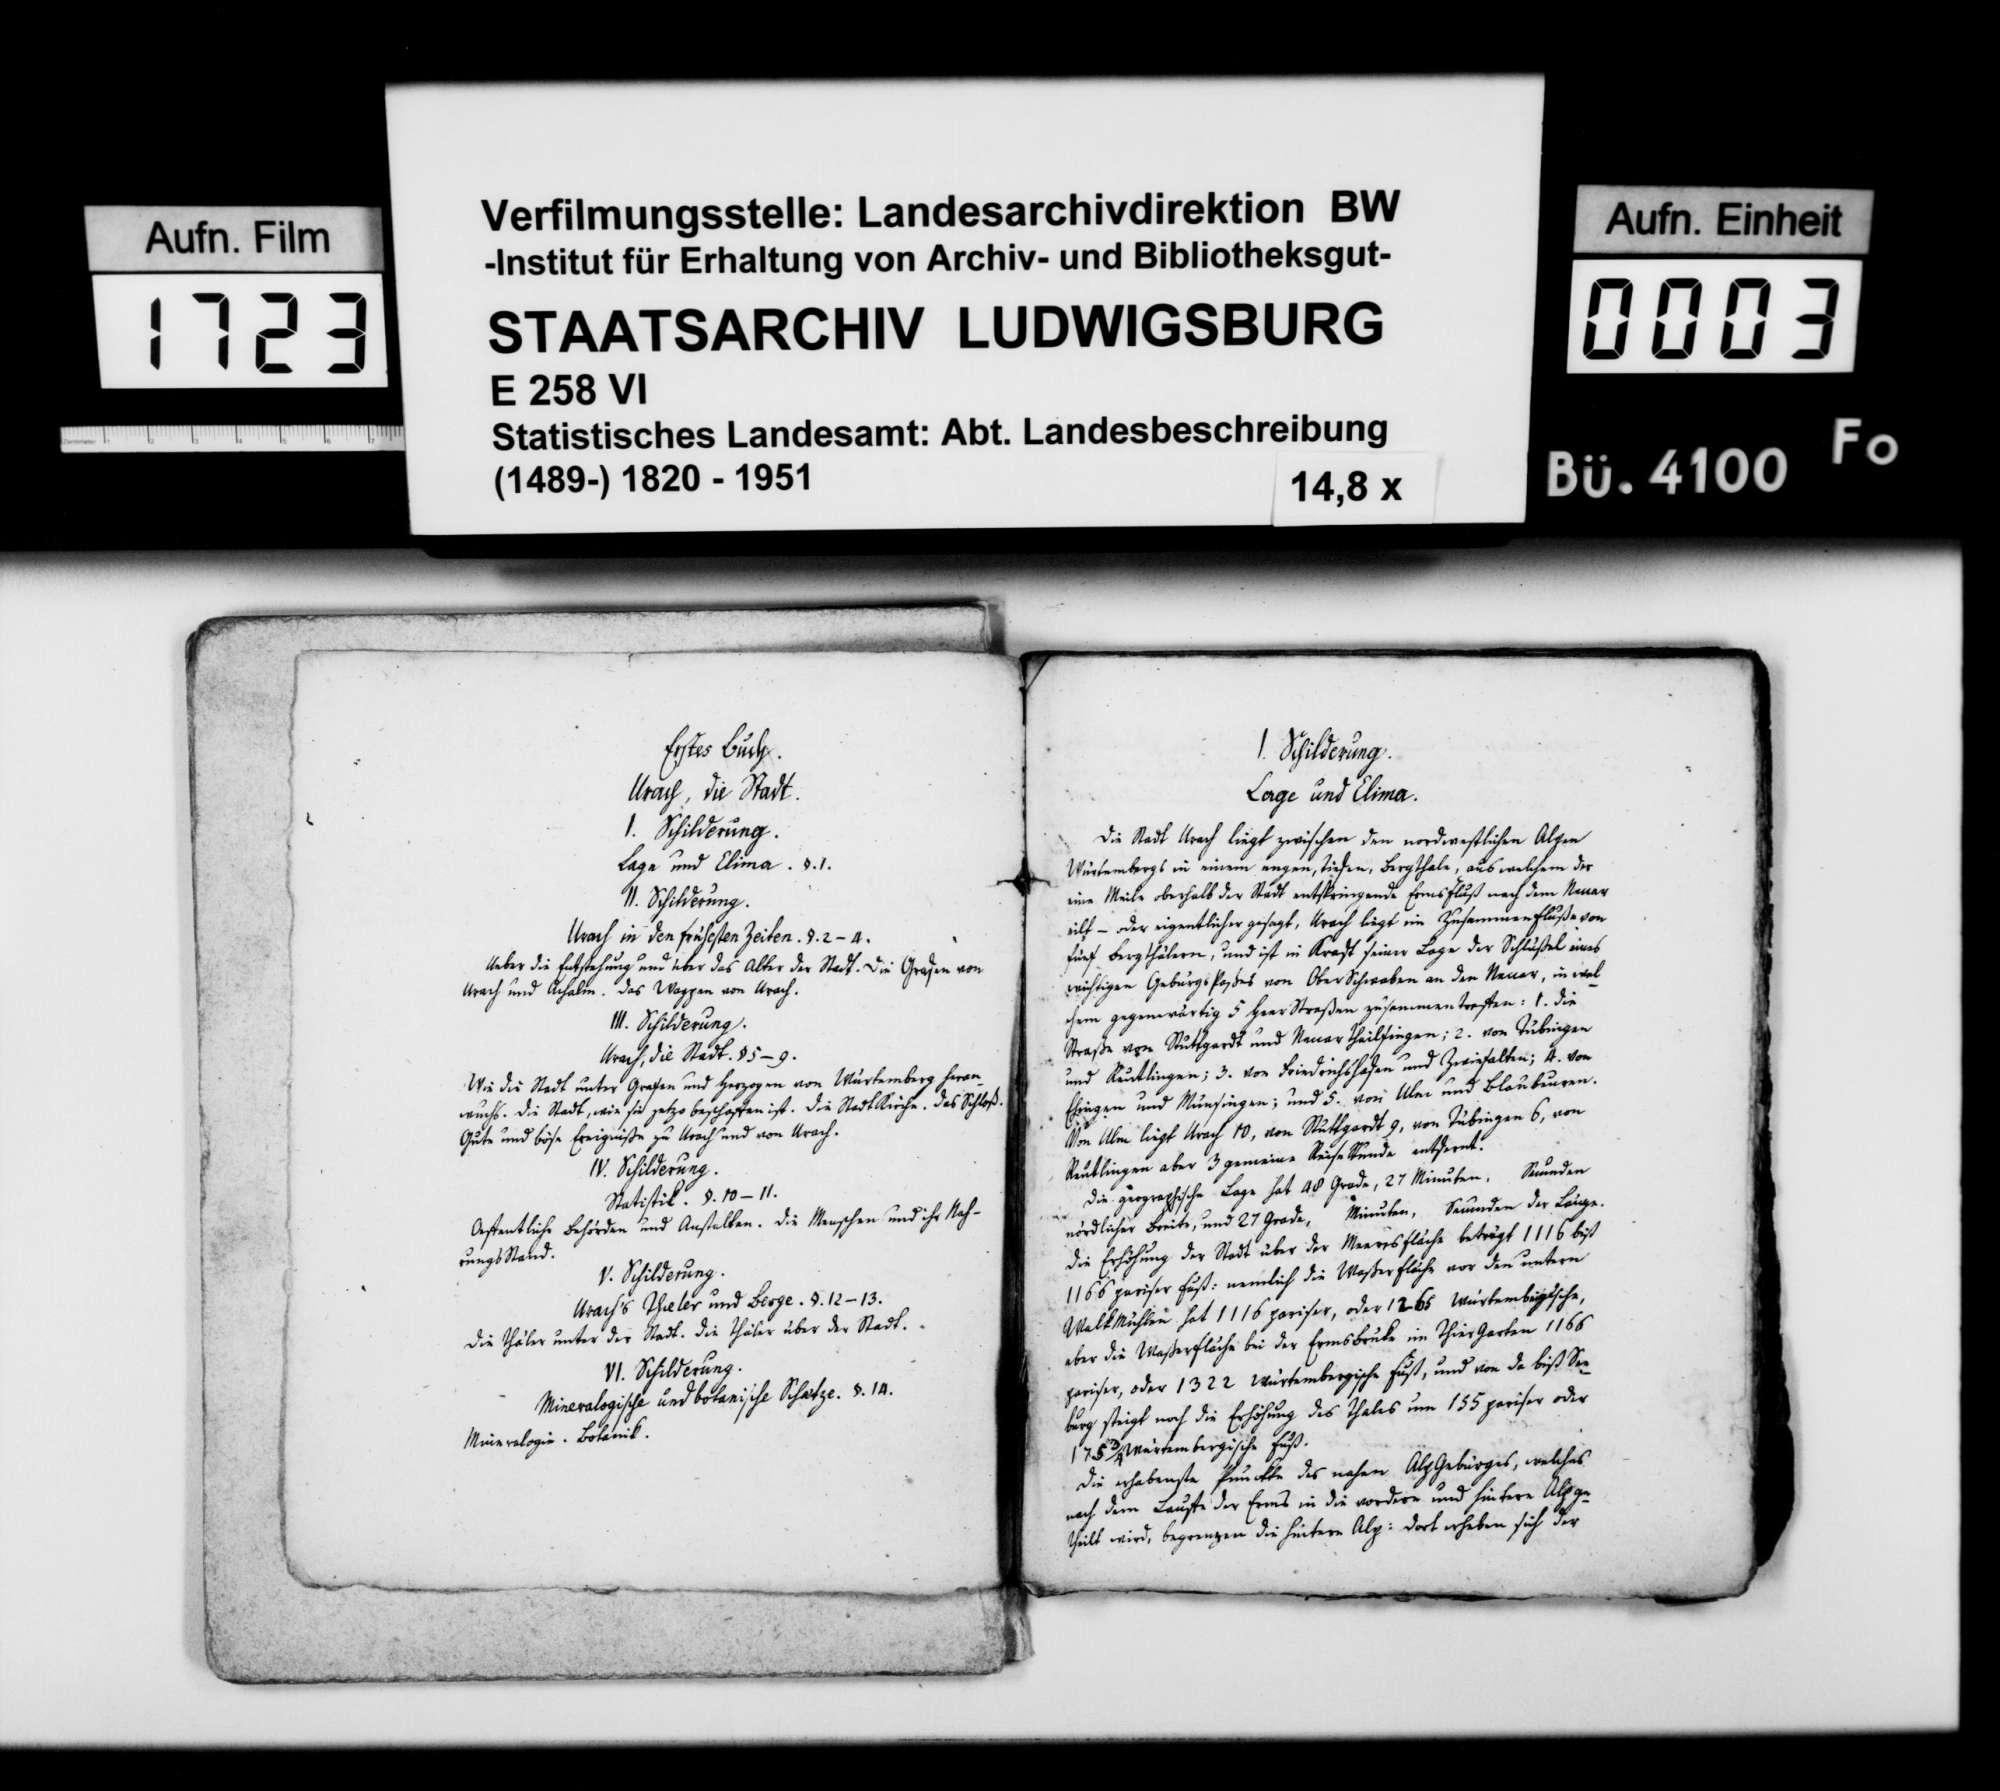 Manuskript des Pfarrers [Karl Christian] Gratianus aus Hengen: Urachs kleine Chronik, 1. Buch: Die Stadt. Dritte Bearbeitungsstufe, Bild 2